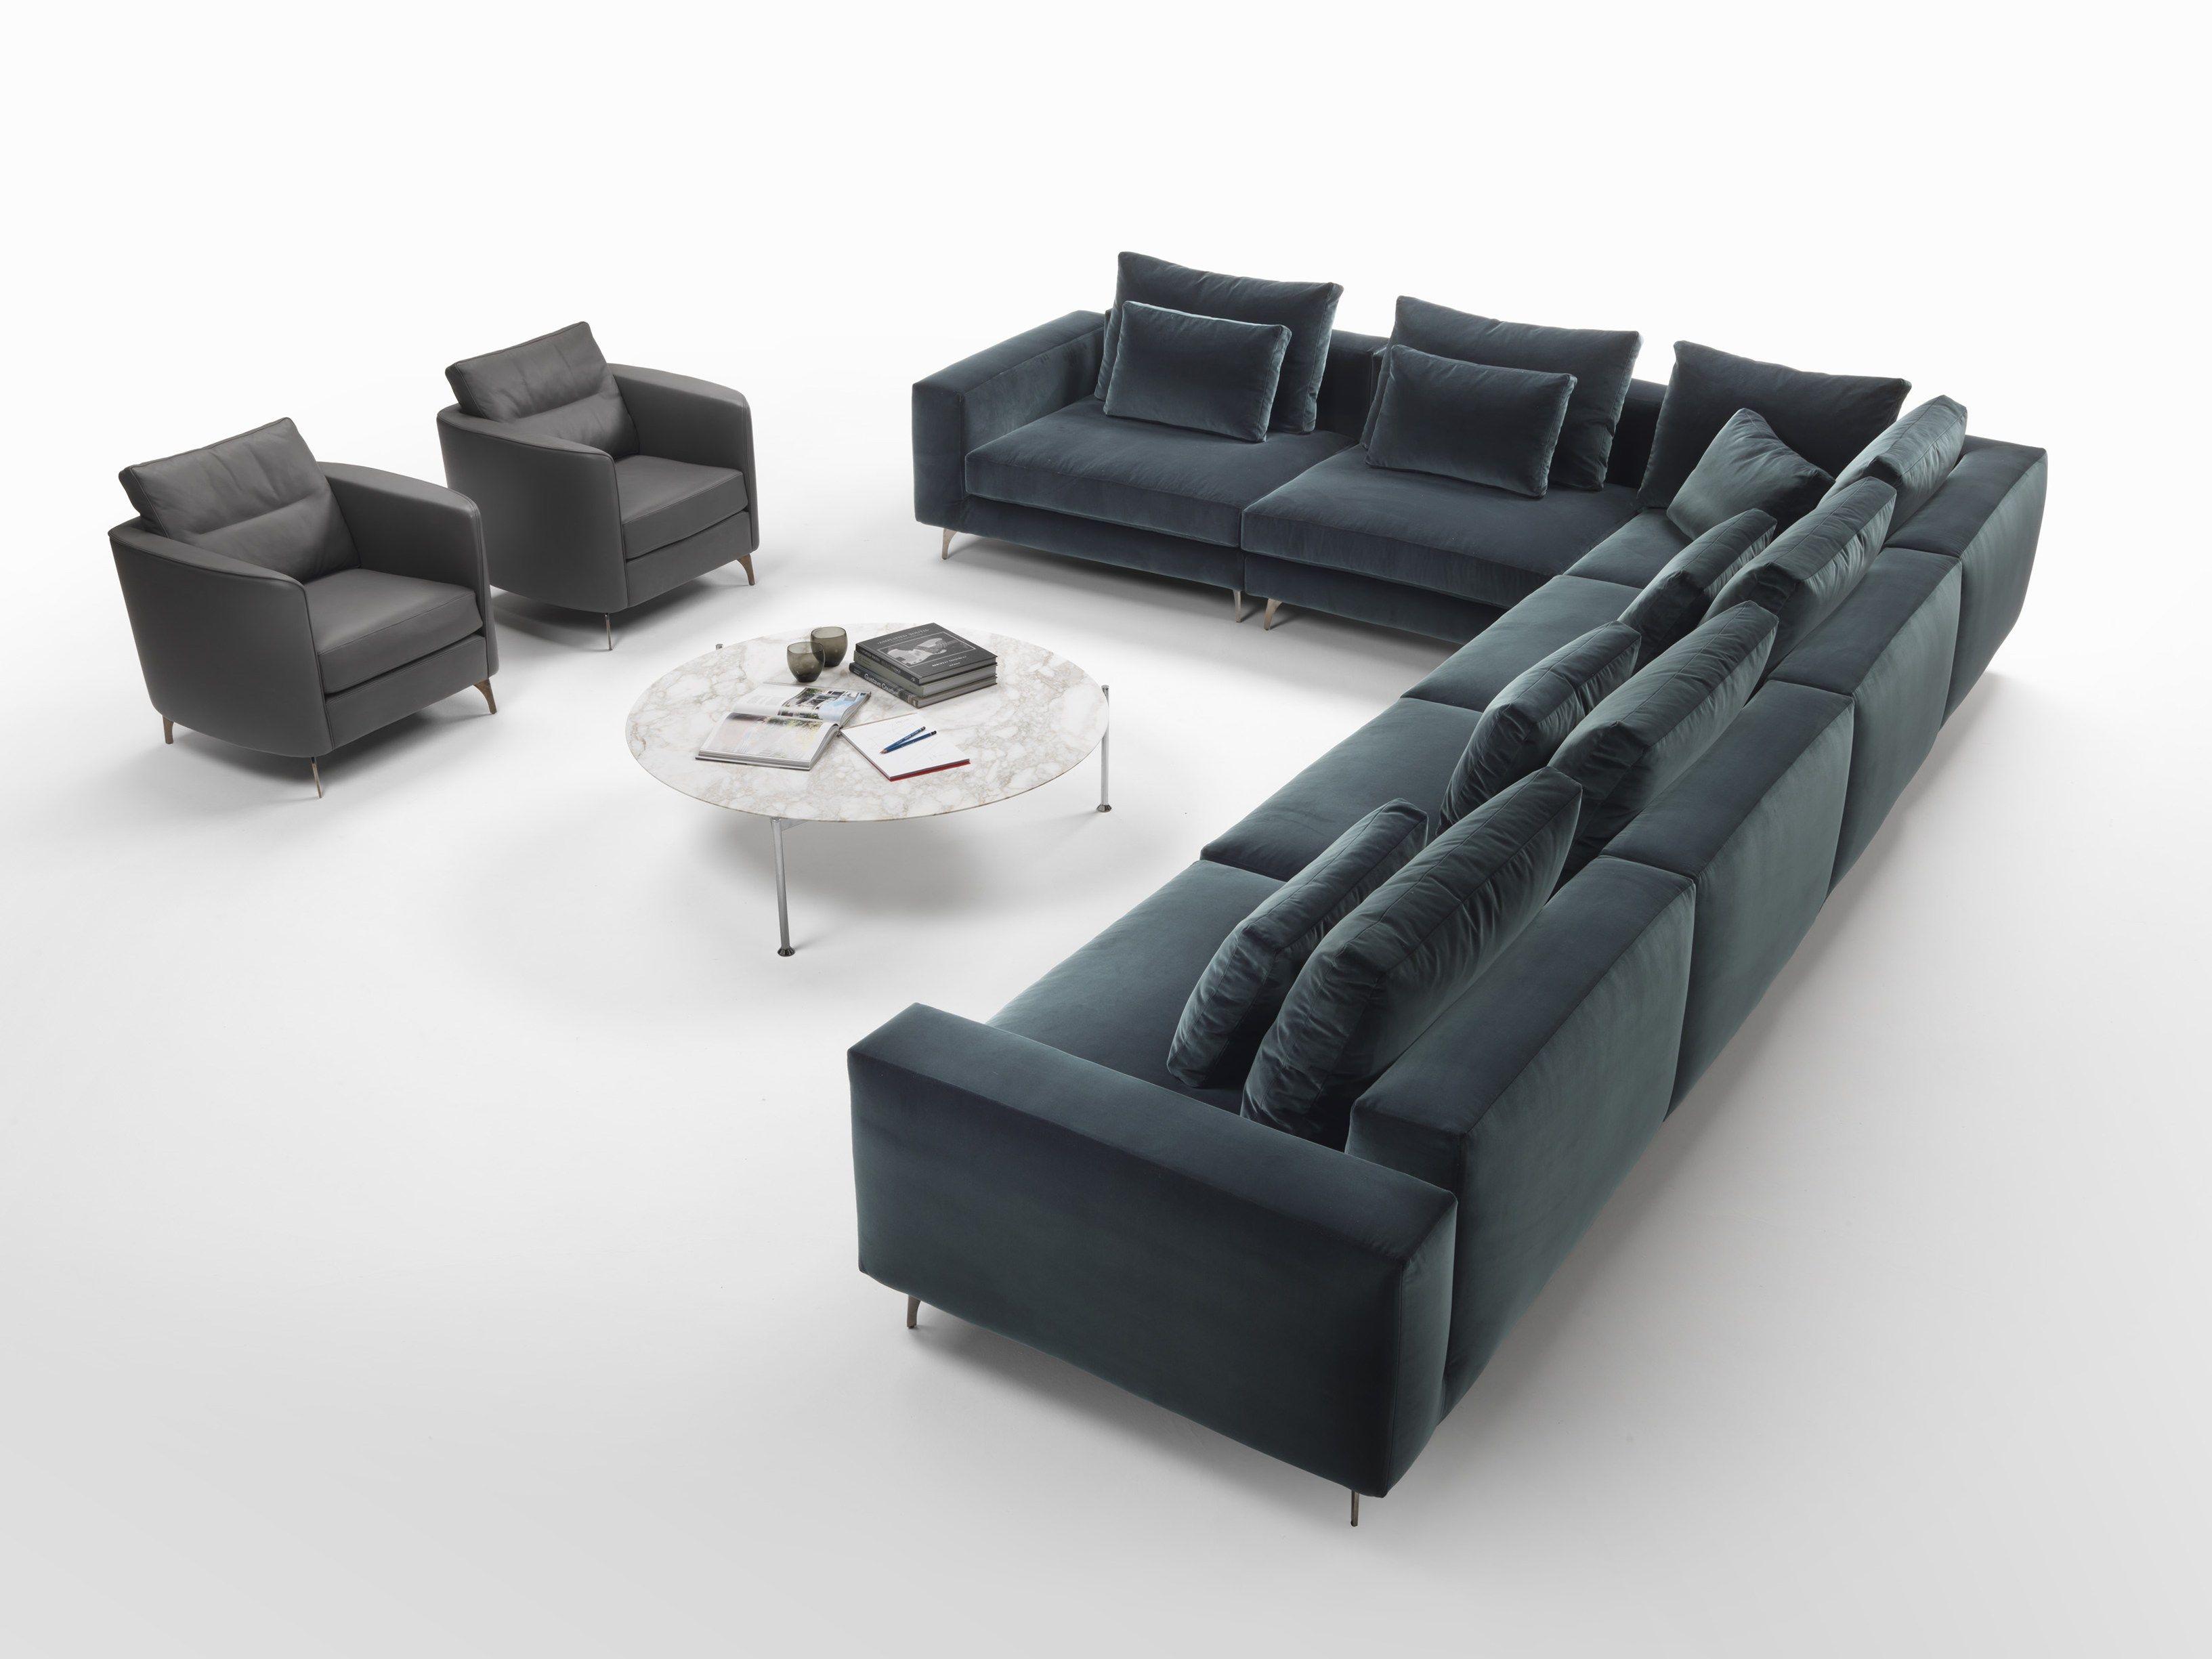 elvis sectional sofa elvis collection by marac. Black Bedroom Furniture Sets. Home Design Ideas